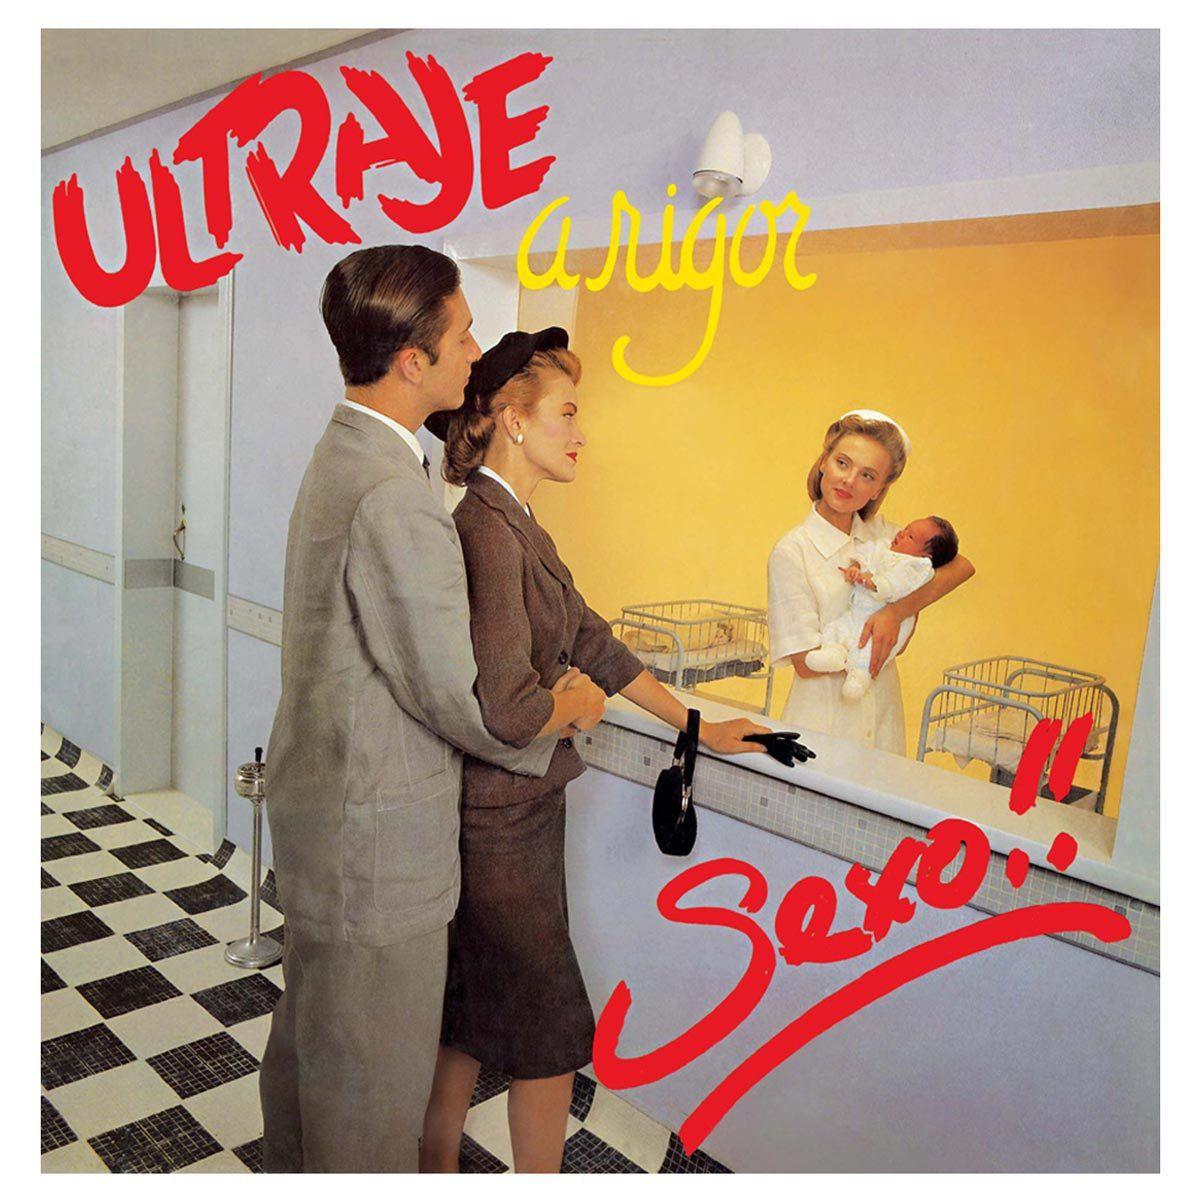 LP Ultraje A Rigor Sexo  - bandUP Store Marketplace